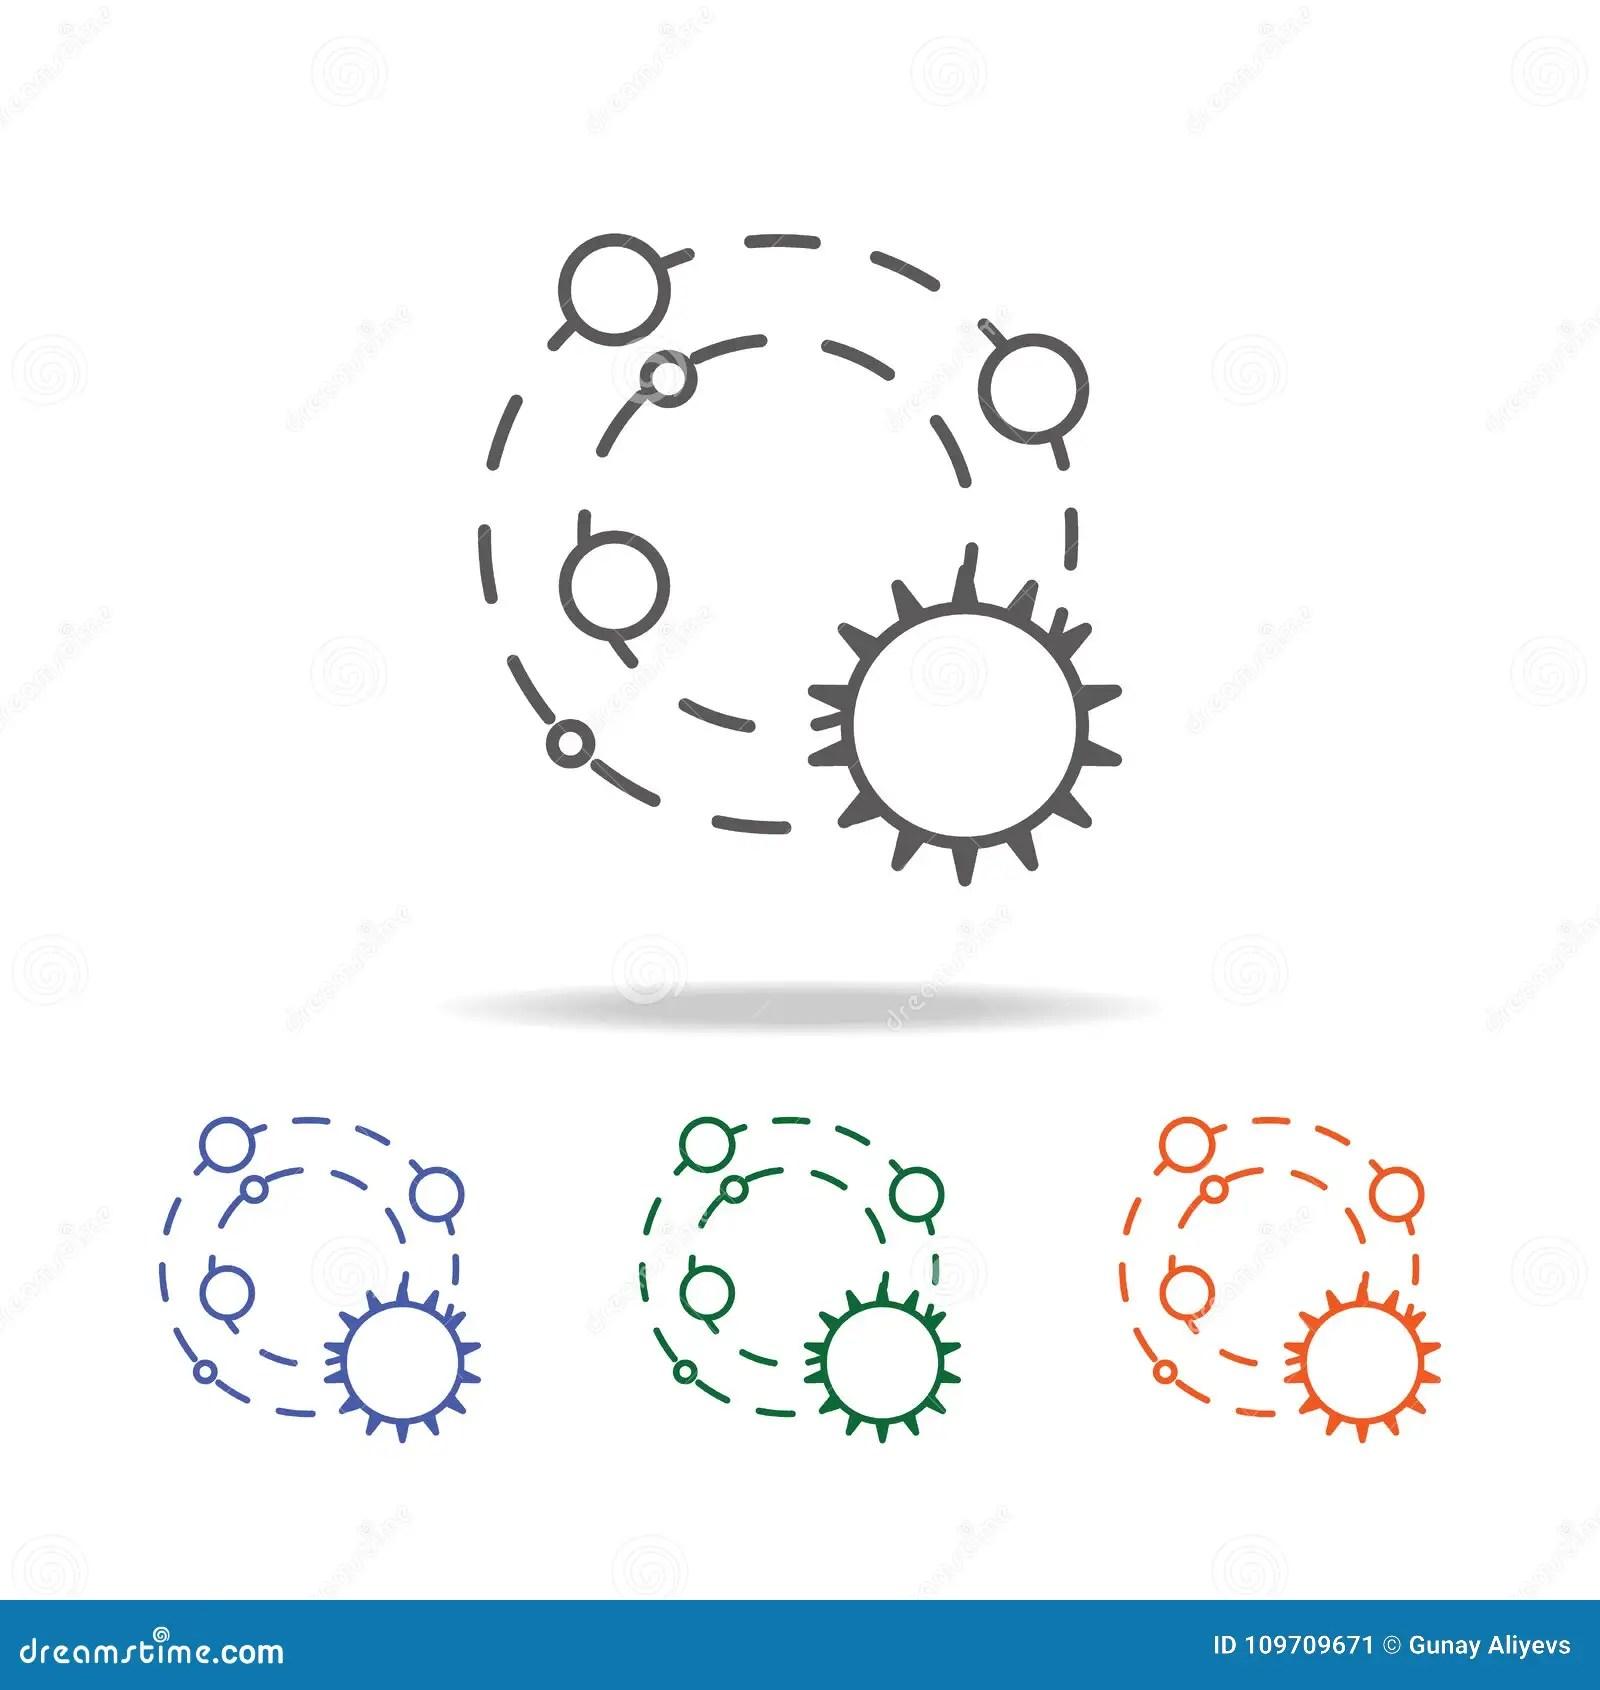 Spiral Development Model Royalty Free Stock Photography